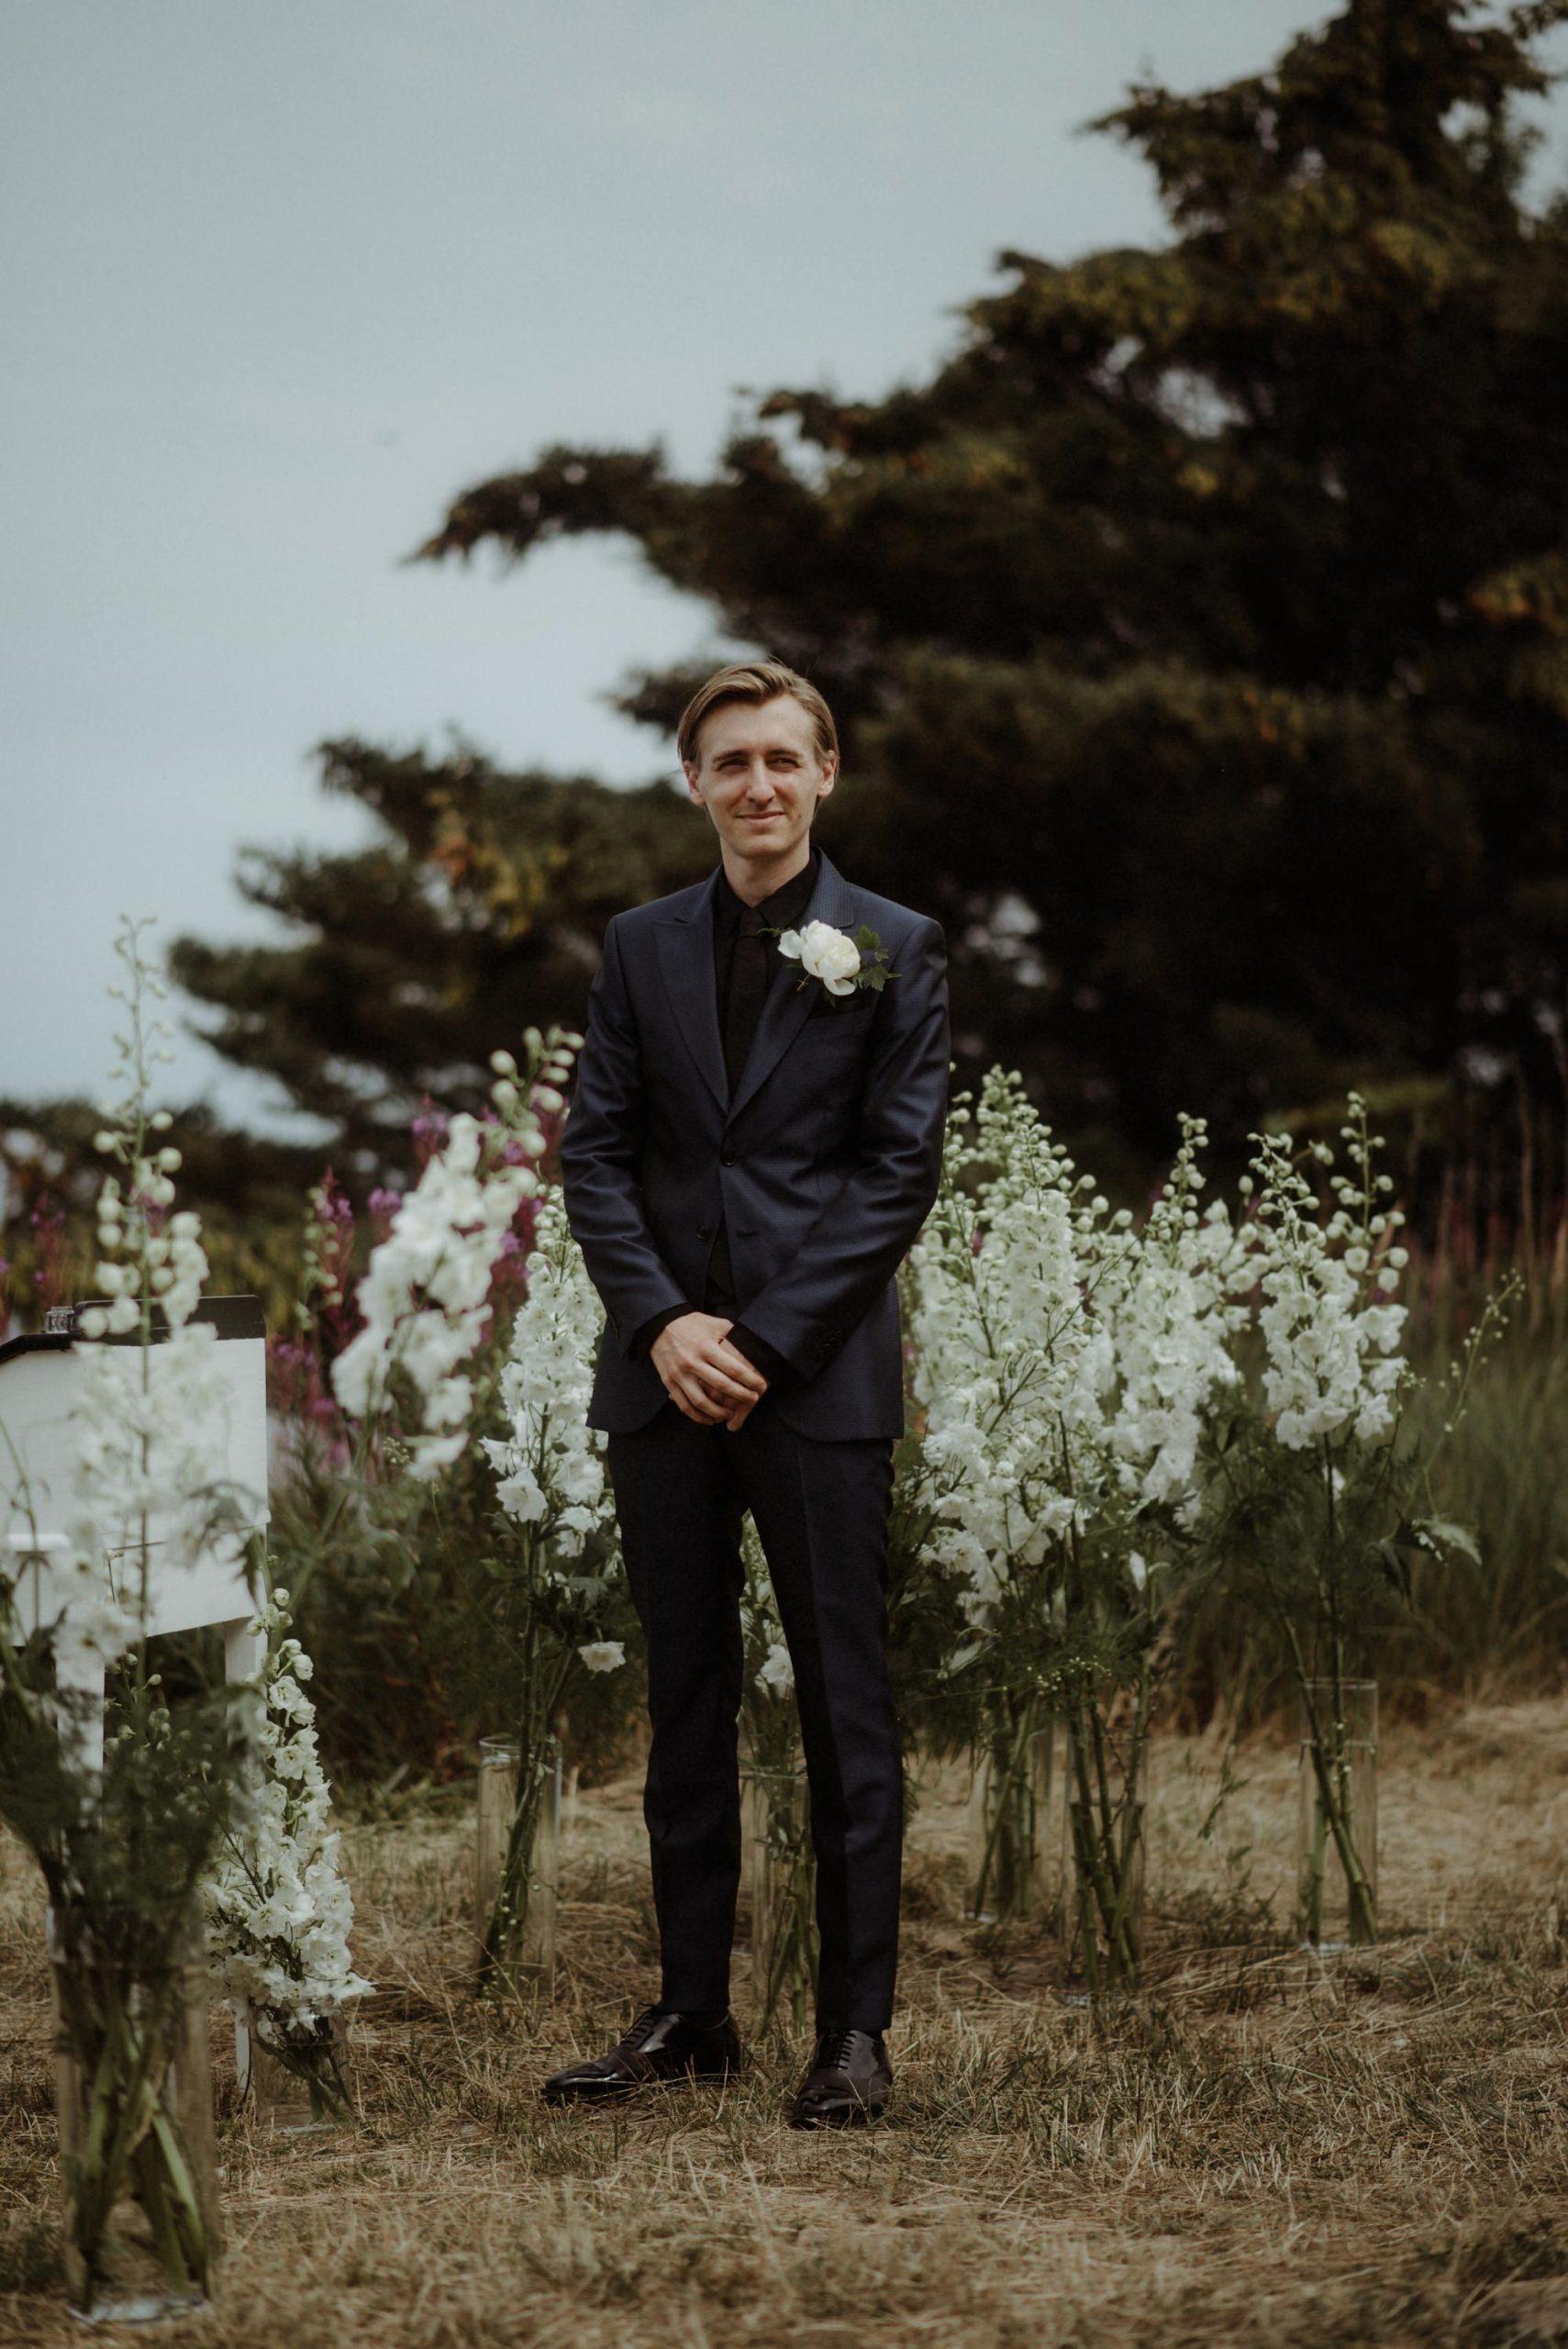 copenhagen wedding photography 0007 1